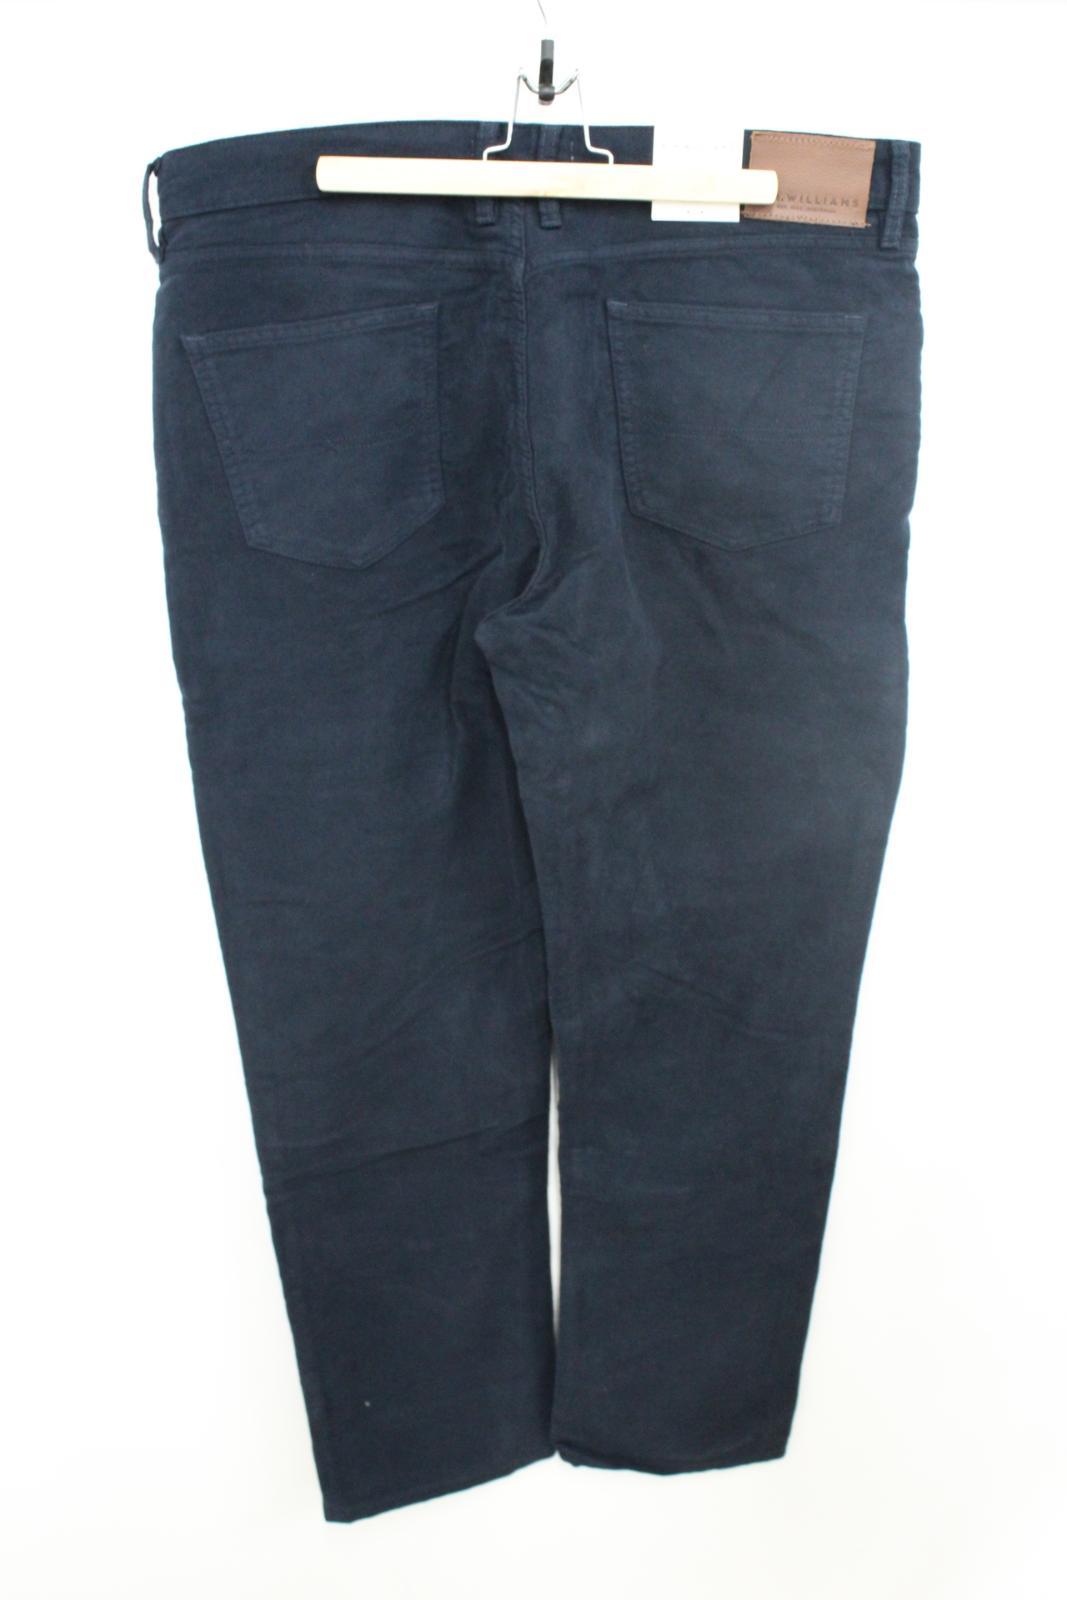 Mens 30l Regular Williams Leg Blue 40in Low m R Tapered Jeans Navy Bnwt Ramco qnOXBtpxX4